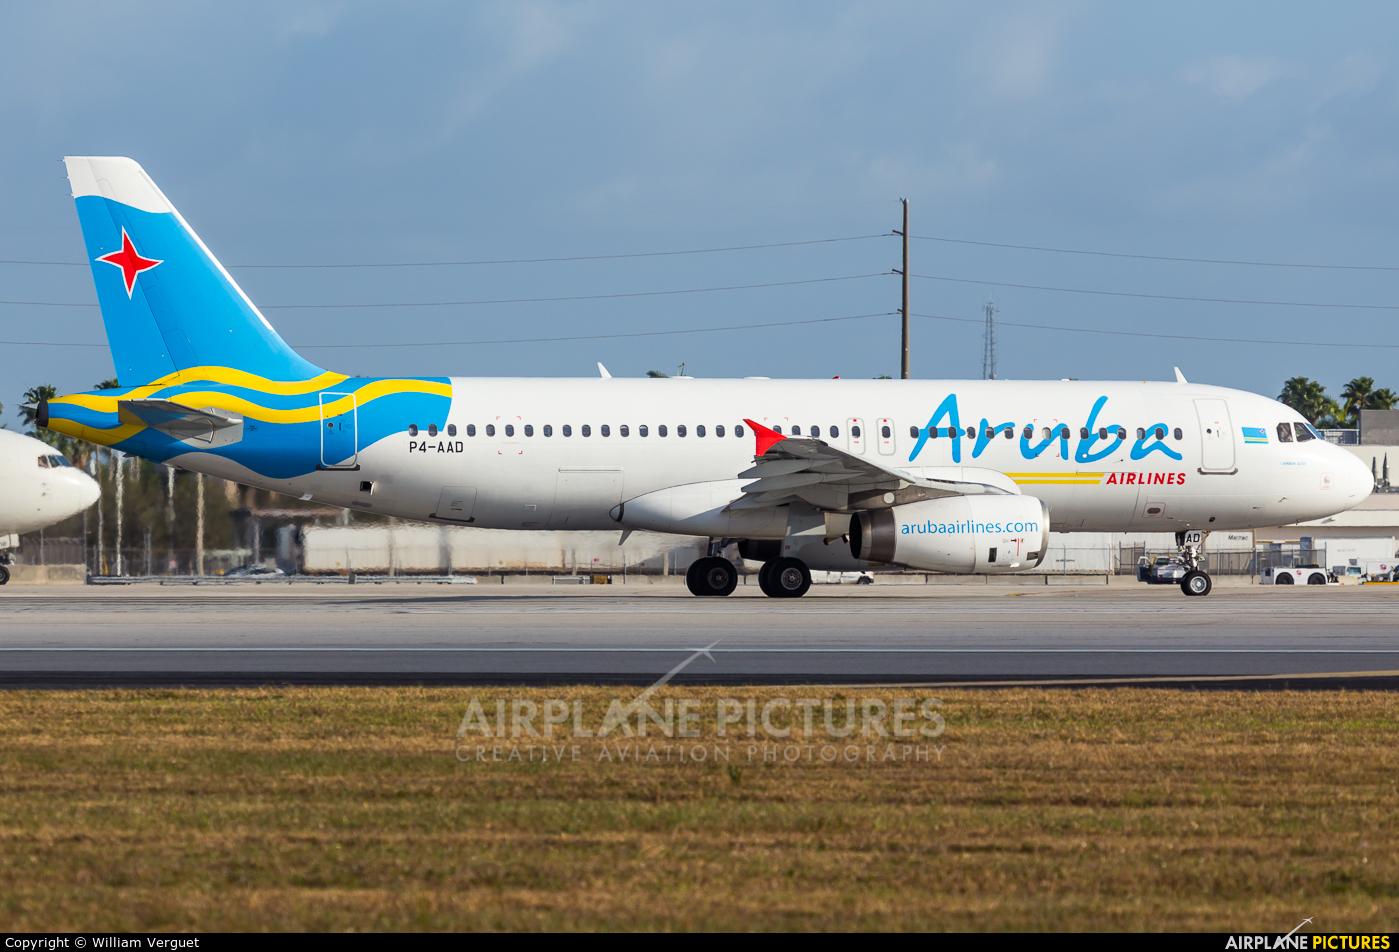 Aruba Airlines P4-AAD aircraft at Miami Intl